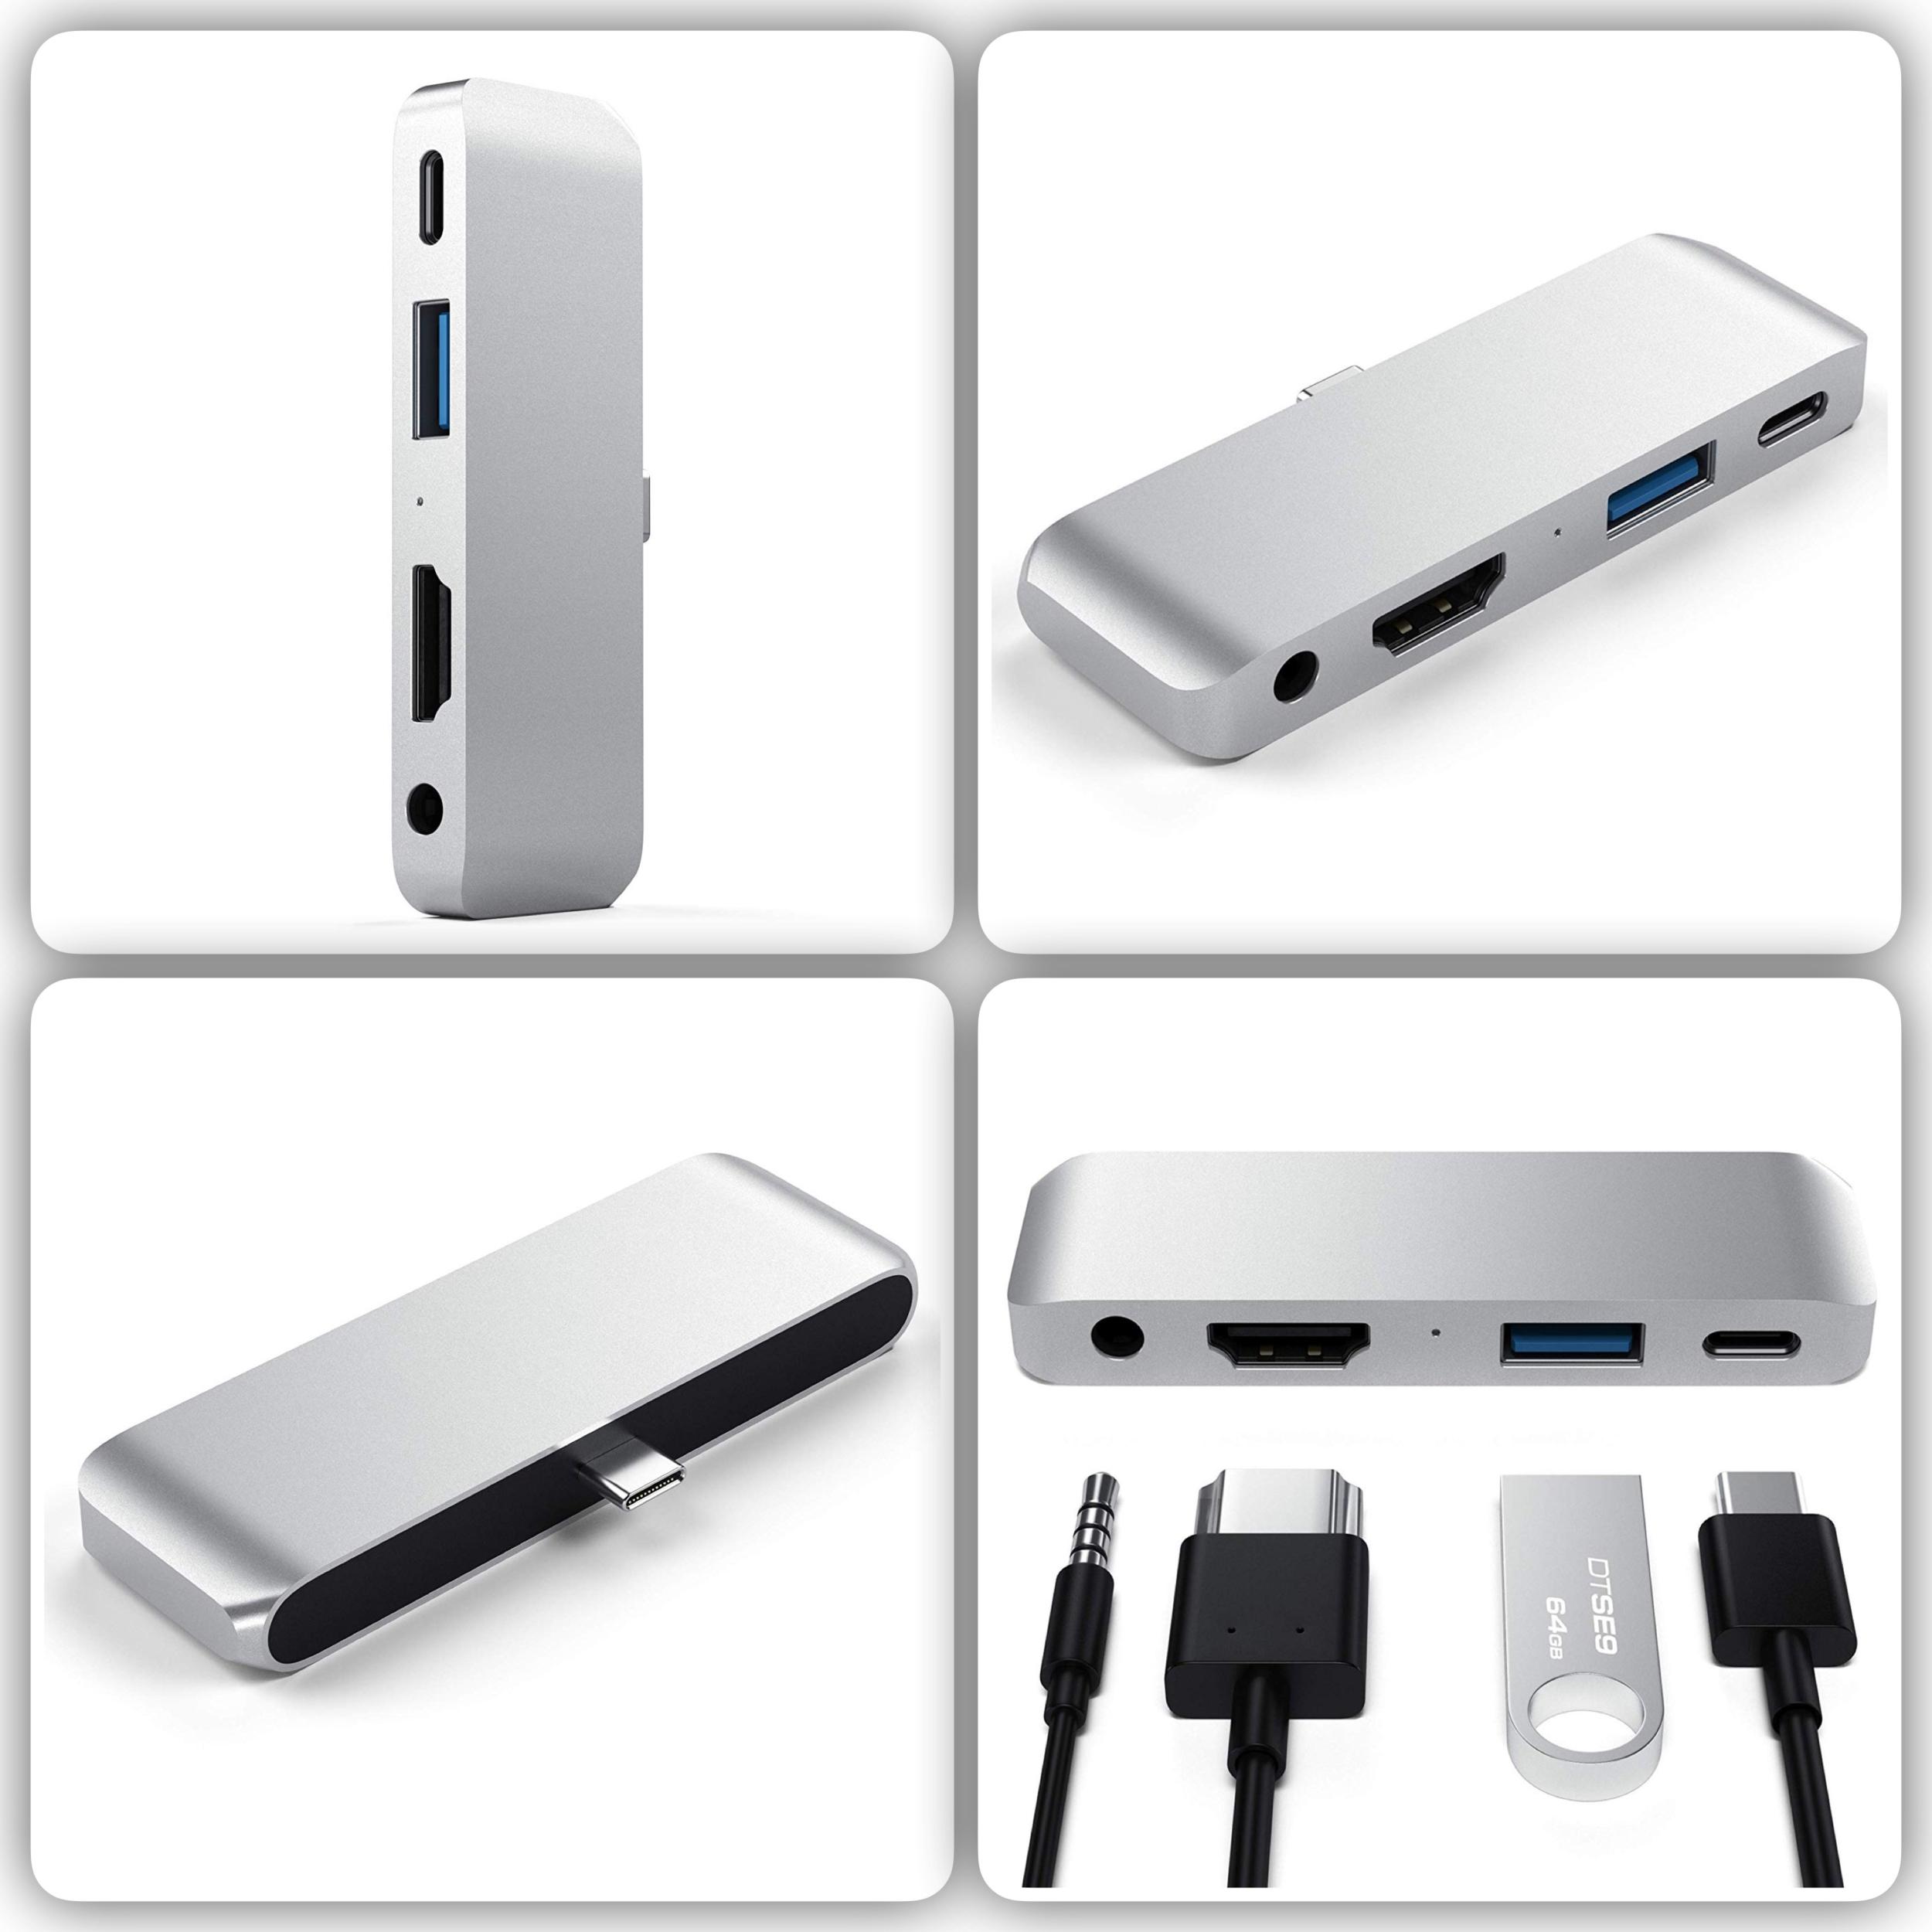 Adaptateur 4 en 1 Galaxy TAB S4 et S3 Galaxy BOOK et Galaxy TAB A 10.5 pouces Smart Pro Hub Aluminium